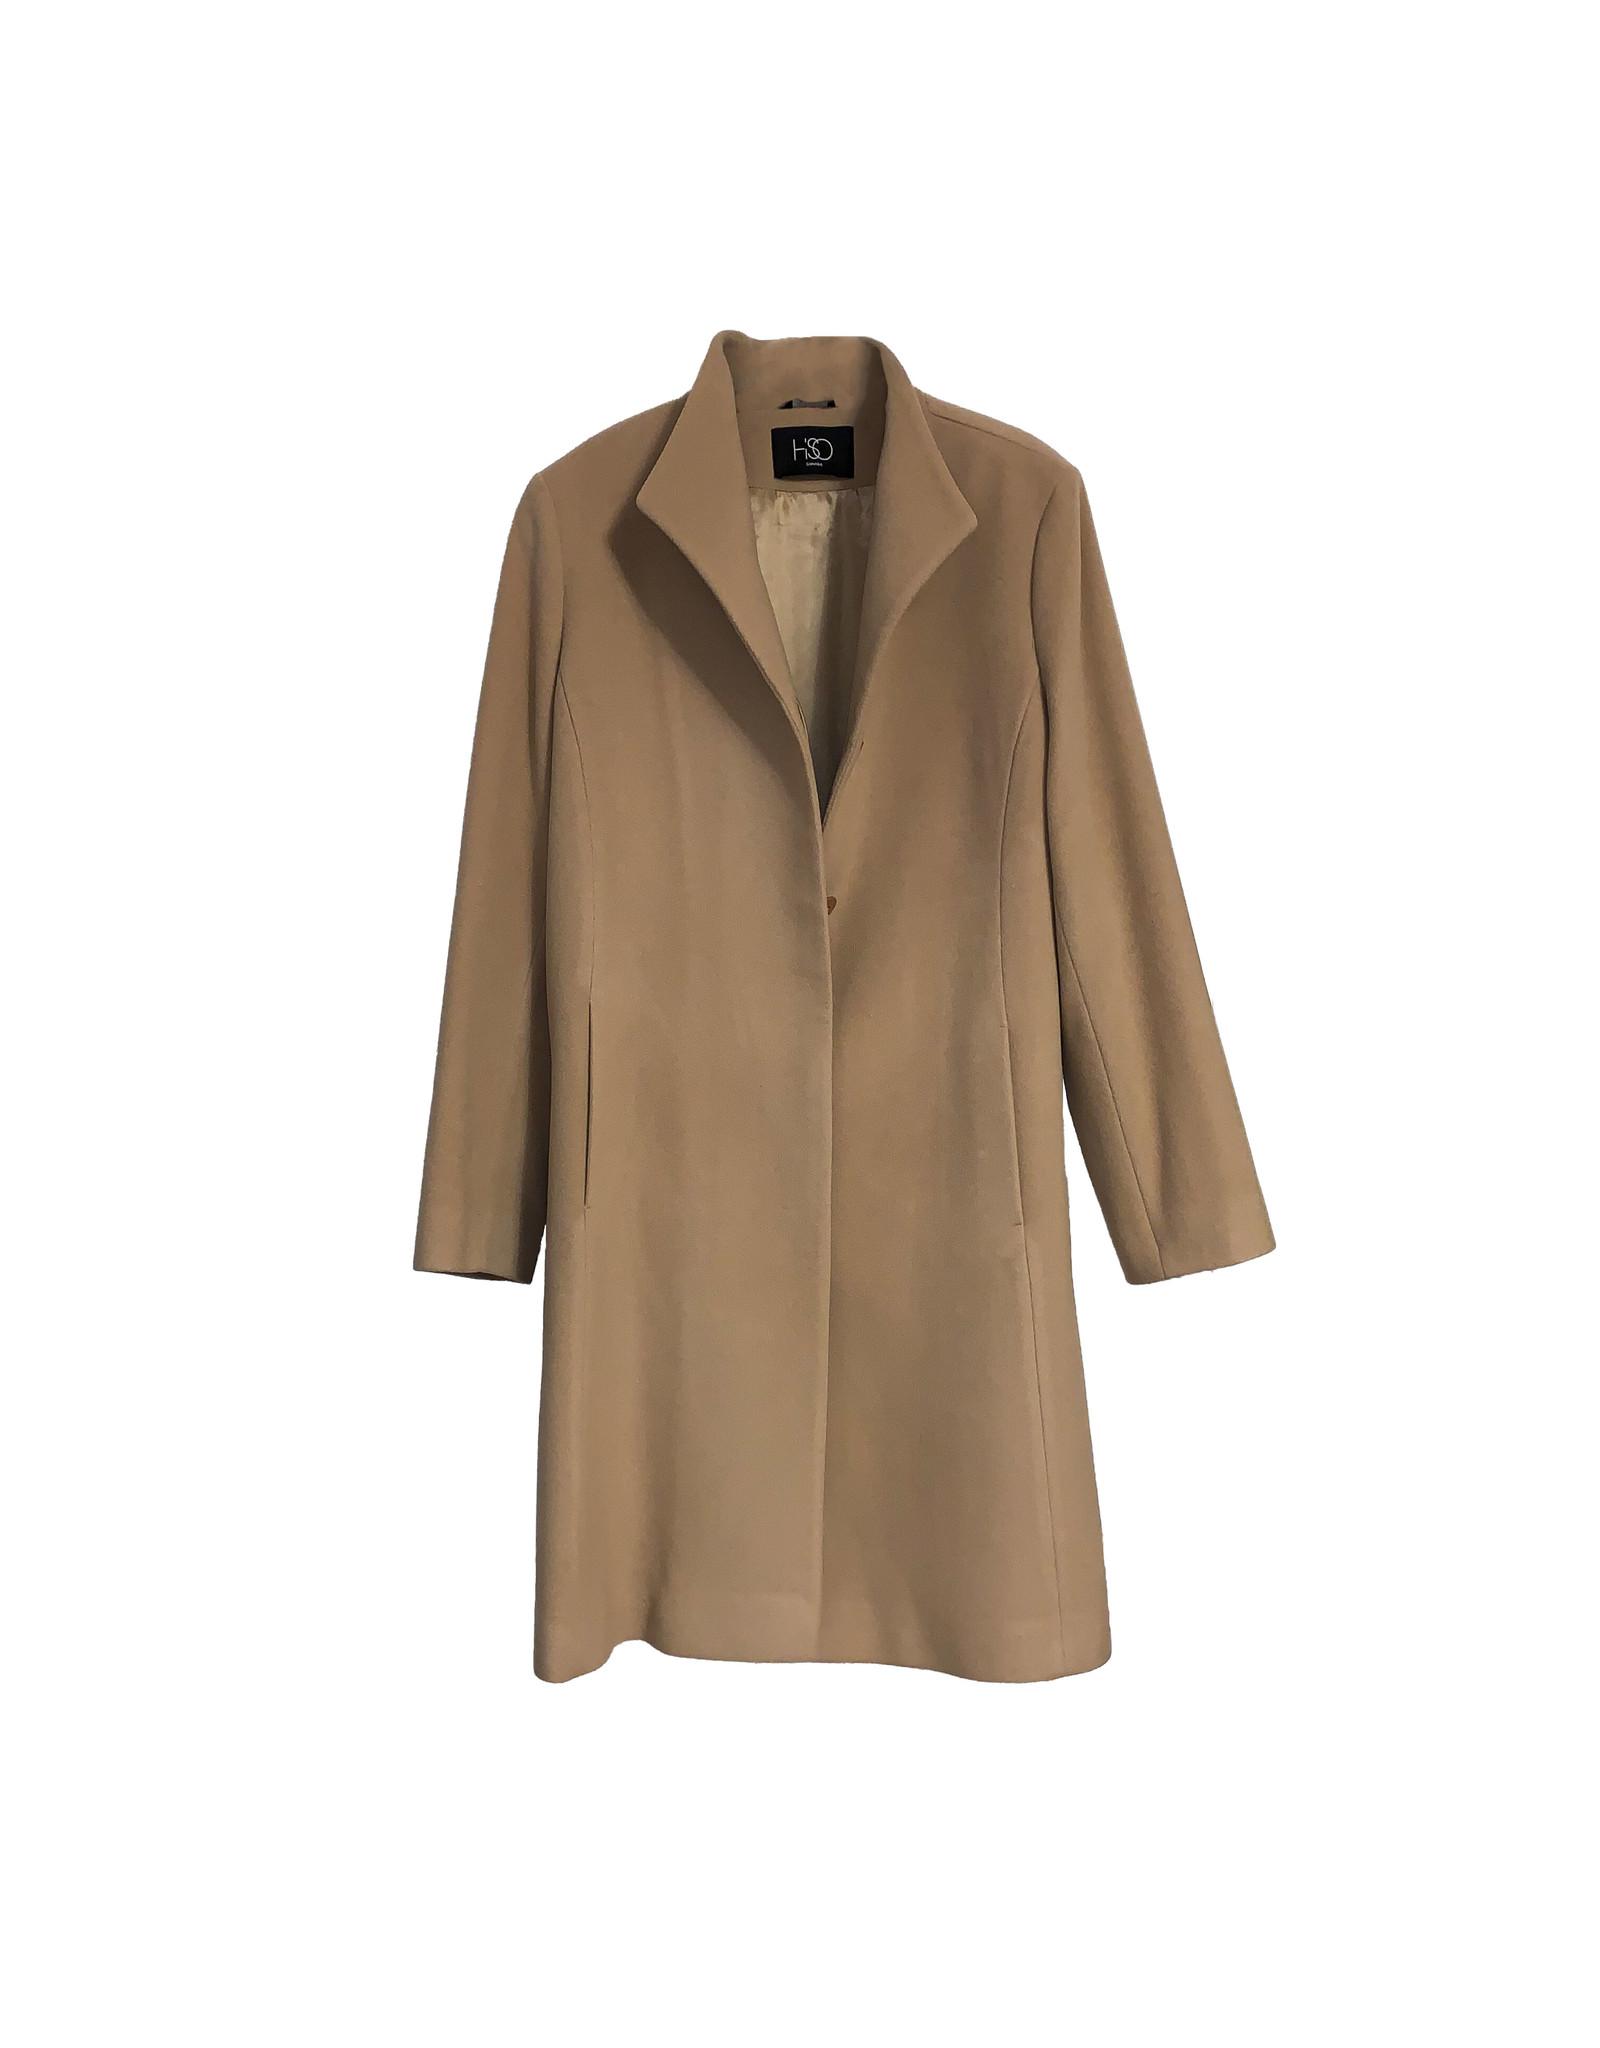 HiSO HiSO Cashmere Blend Coat